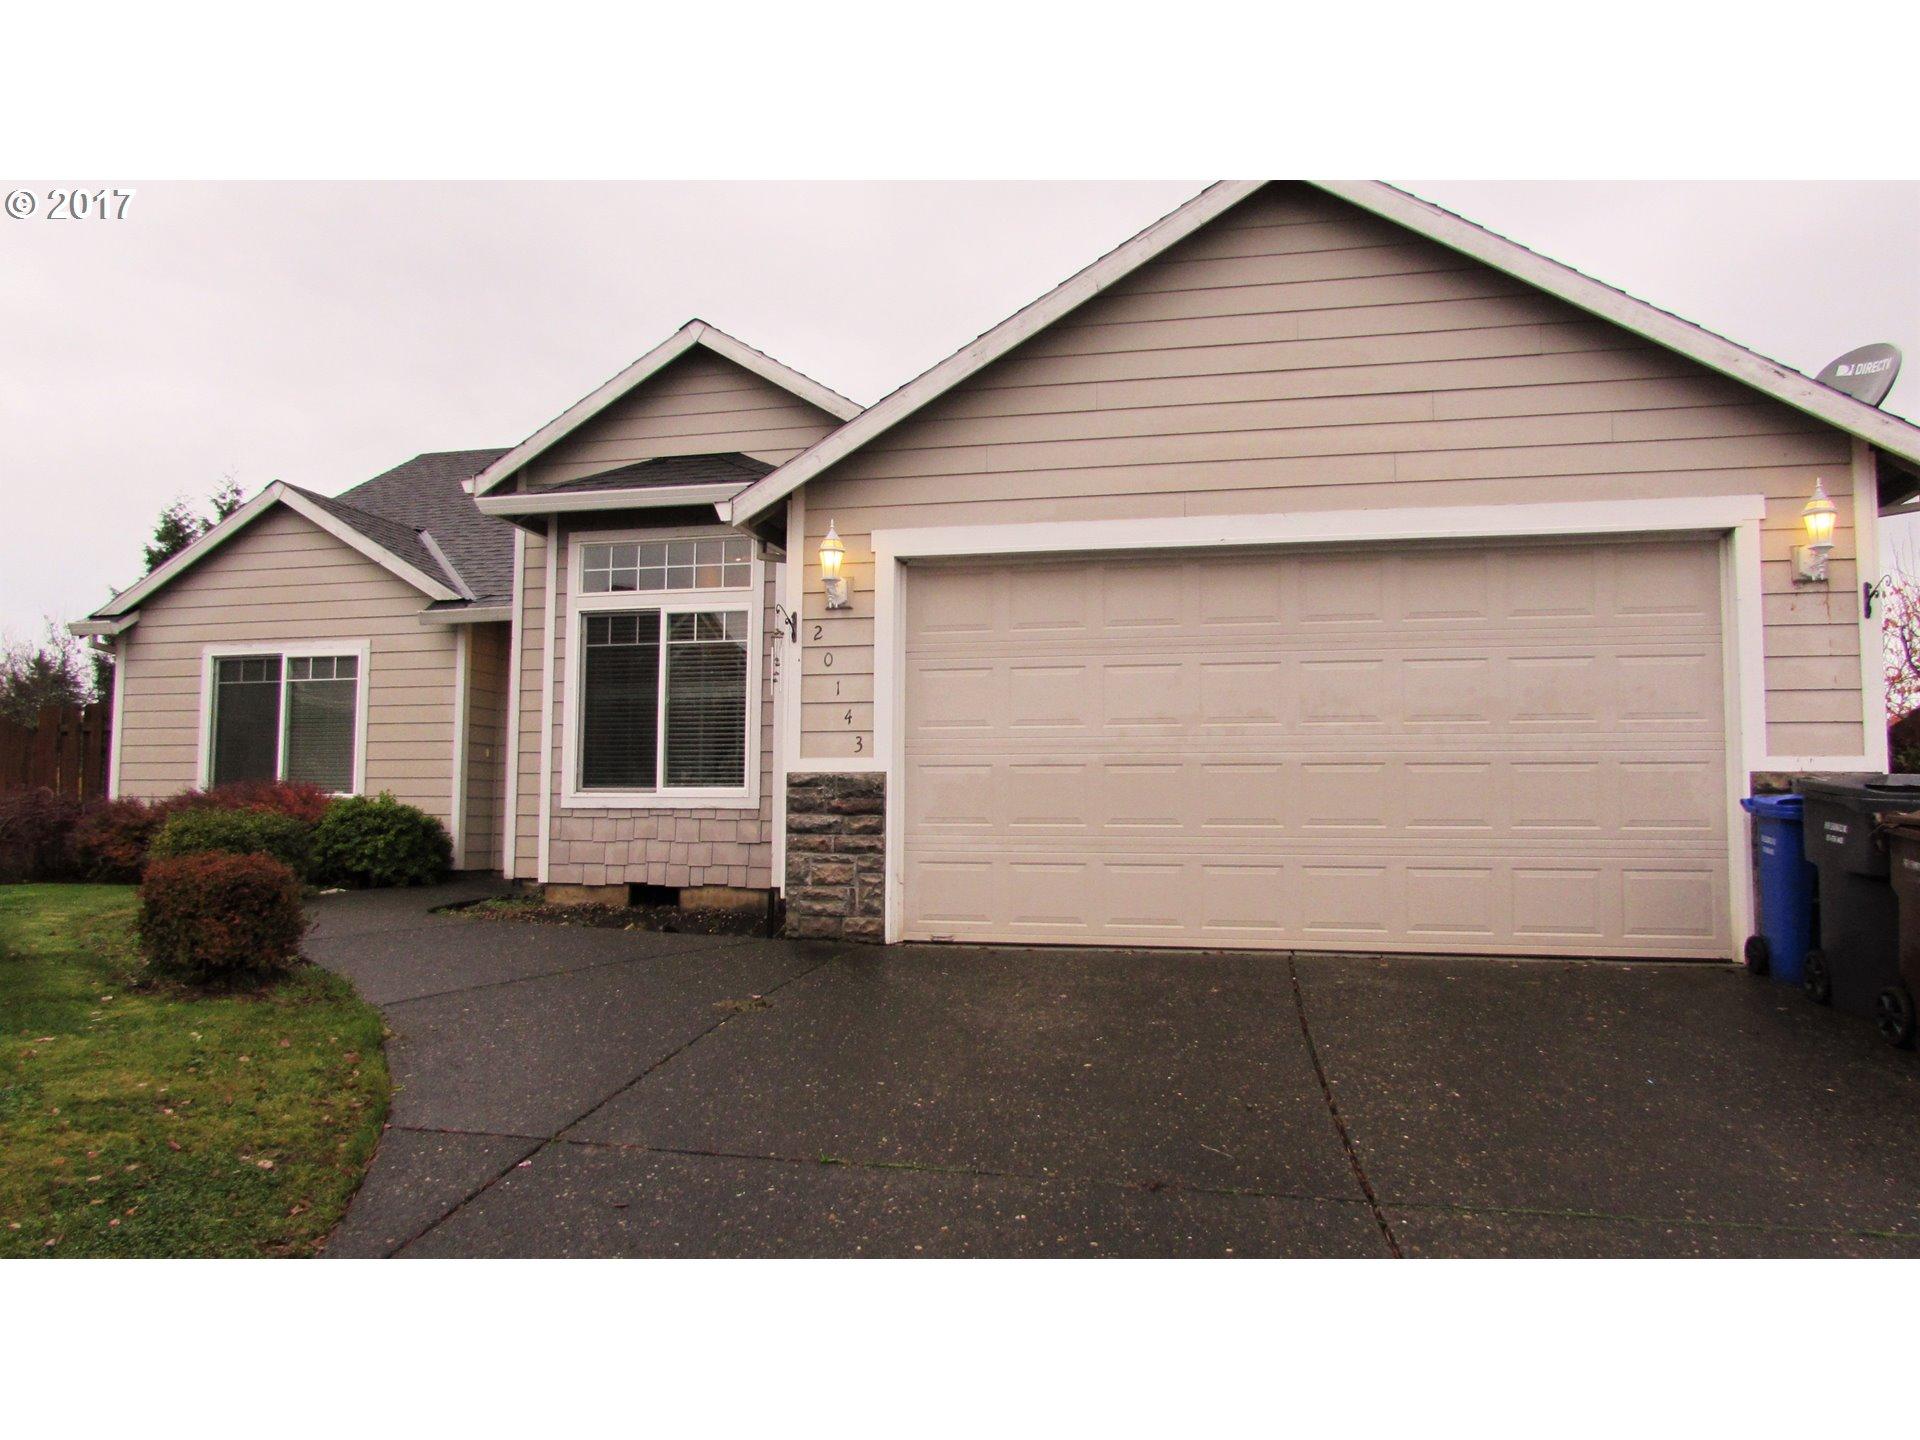 20143 SPYGLASS CT OREGON CITY OR 97045 Oregon City Realtor